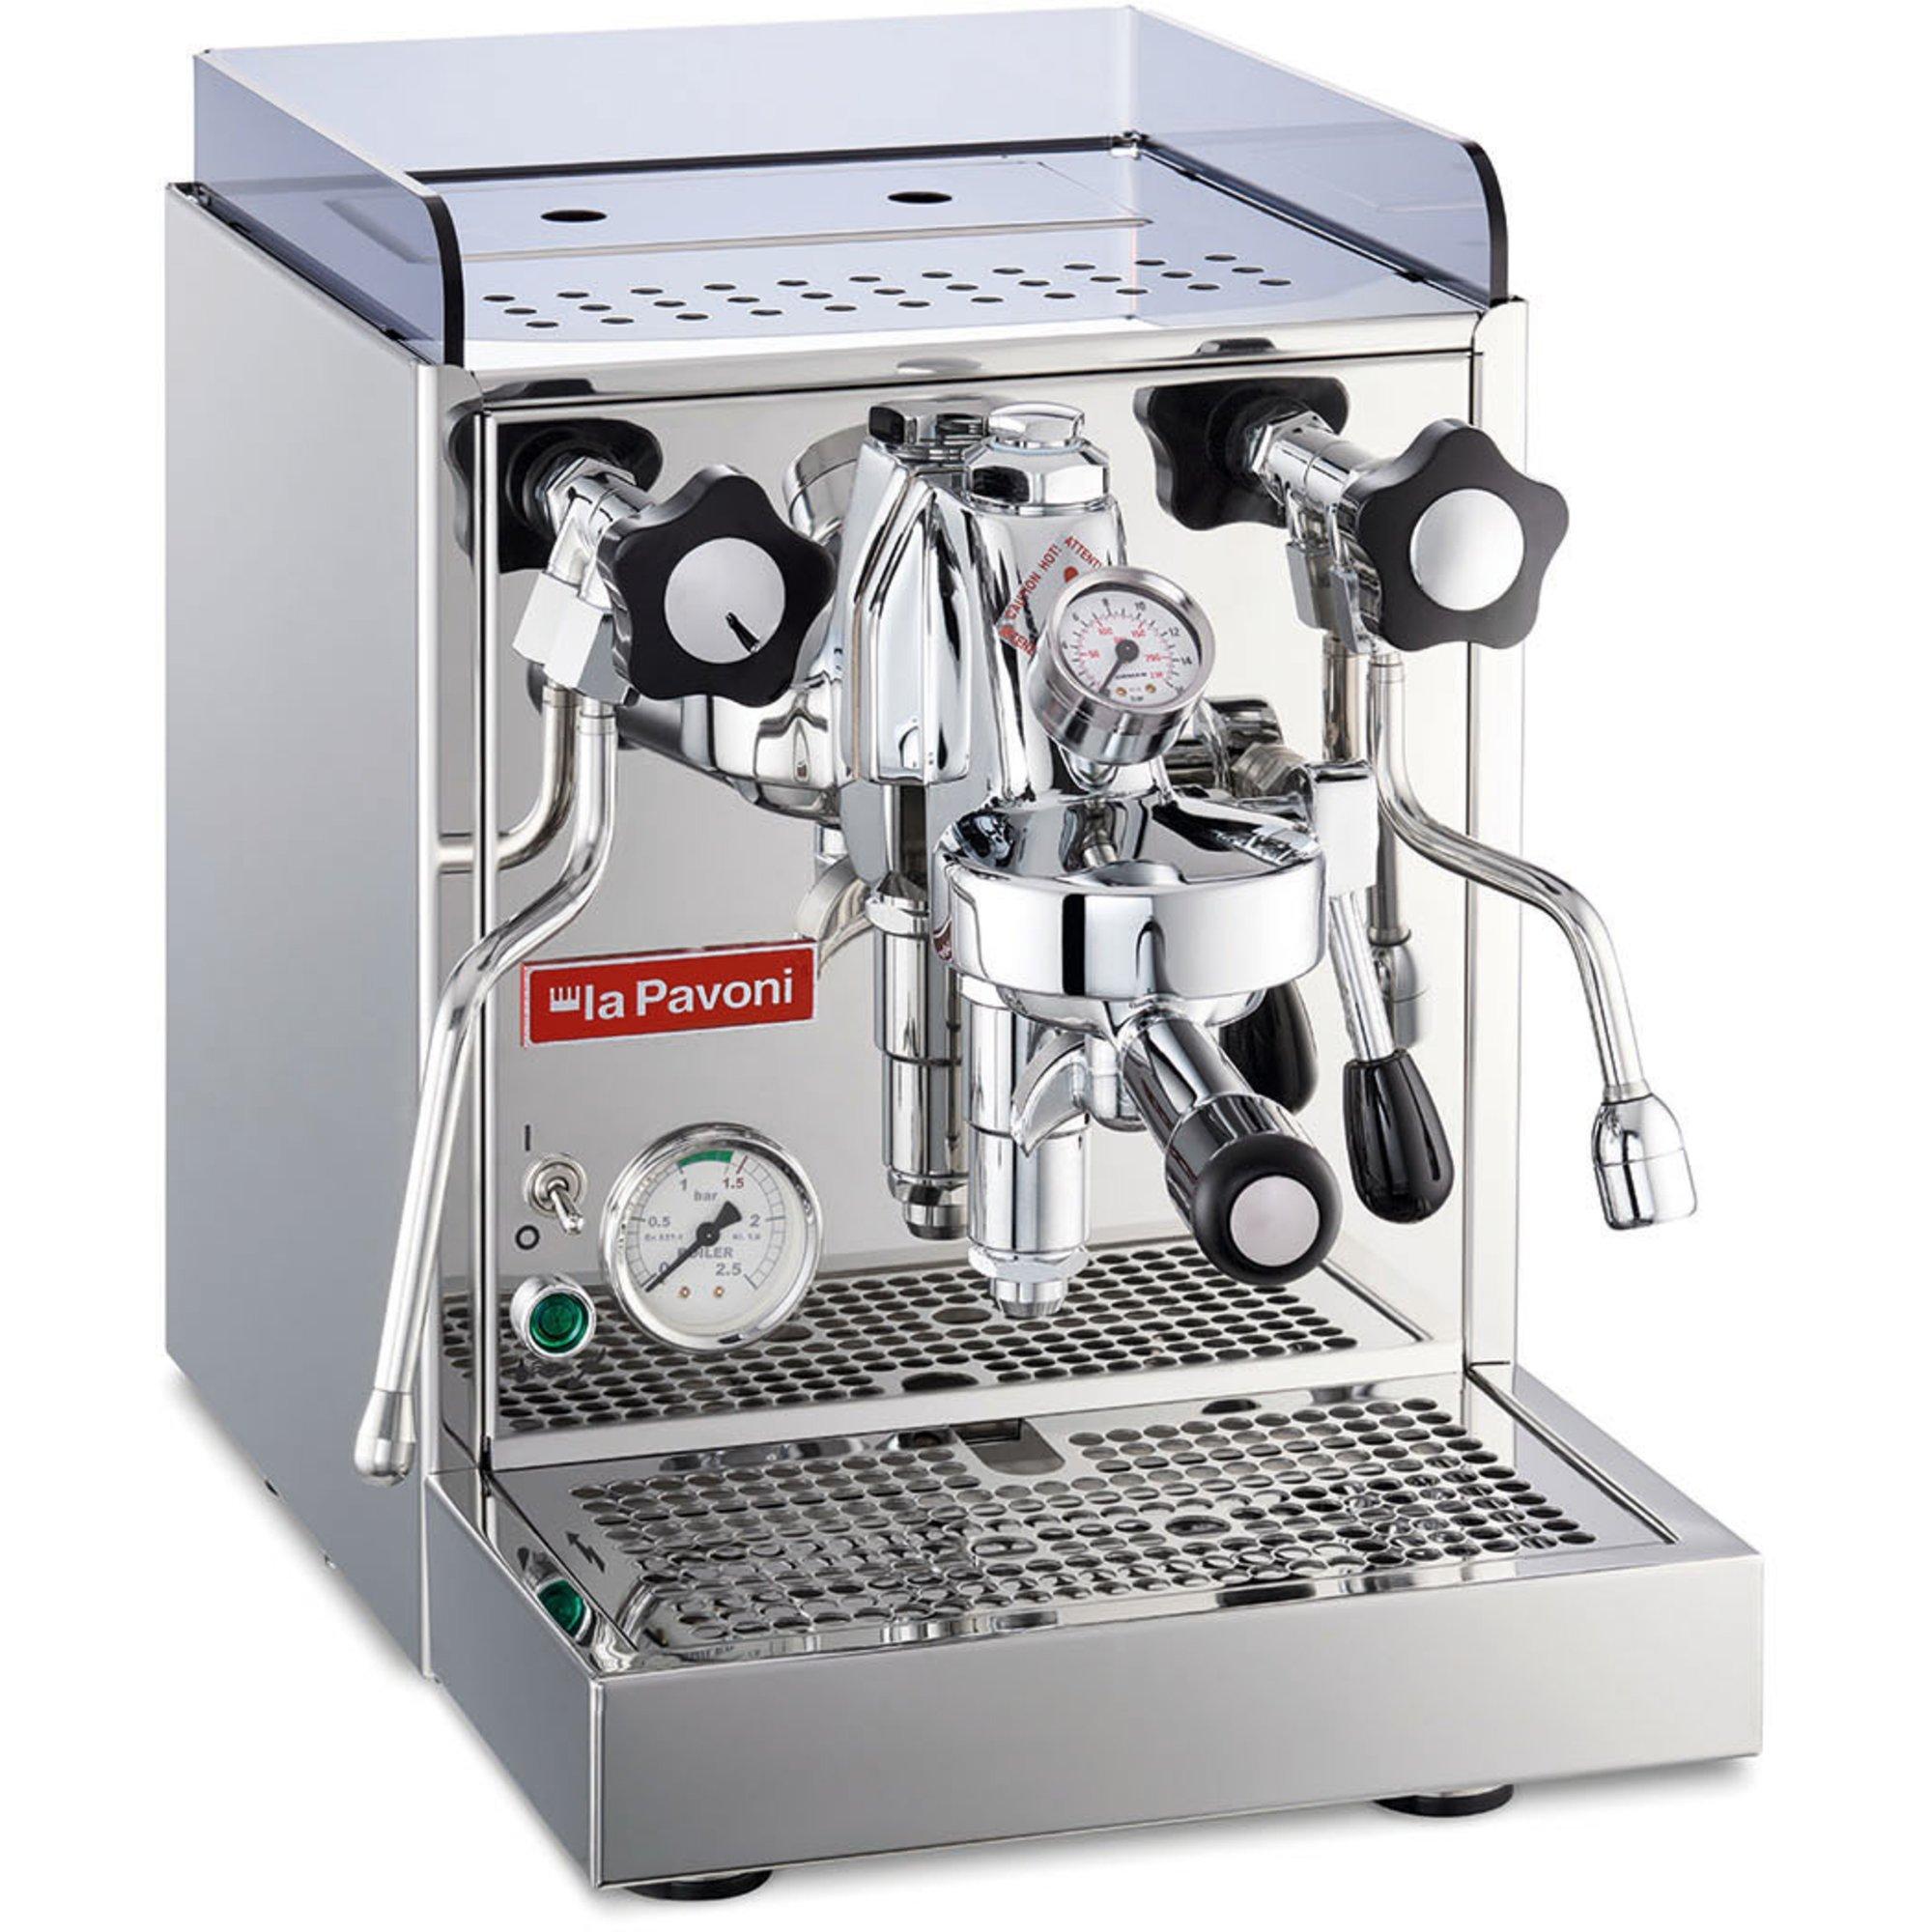 La Pavoni Cellini Classic Espressomaskin stål LPSCCC01EU